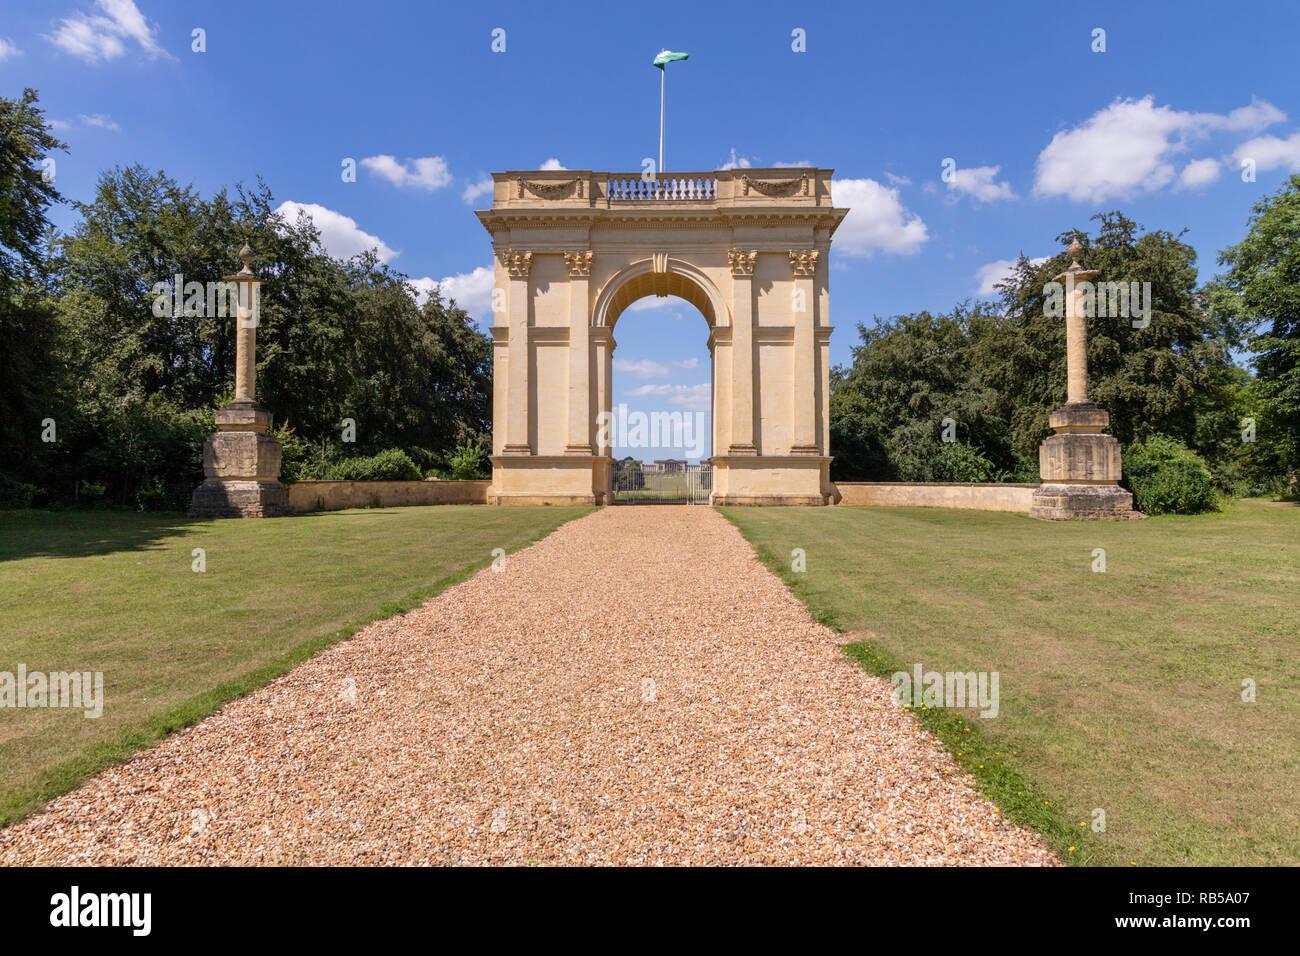 The Corinthian Arch on the original driveway to Stowe House, Buckinghamshire UK - Stock Image